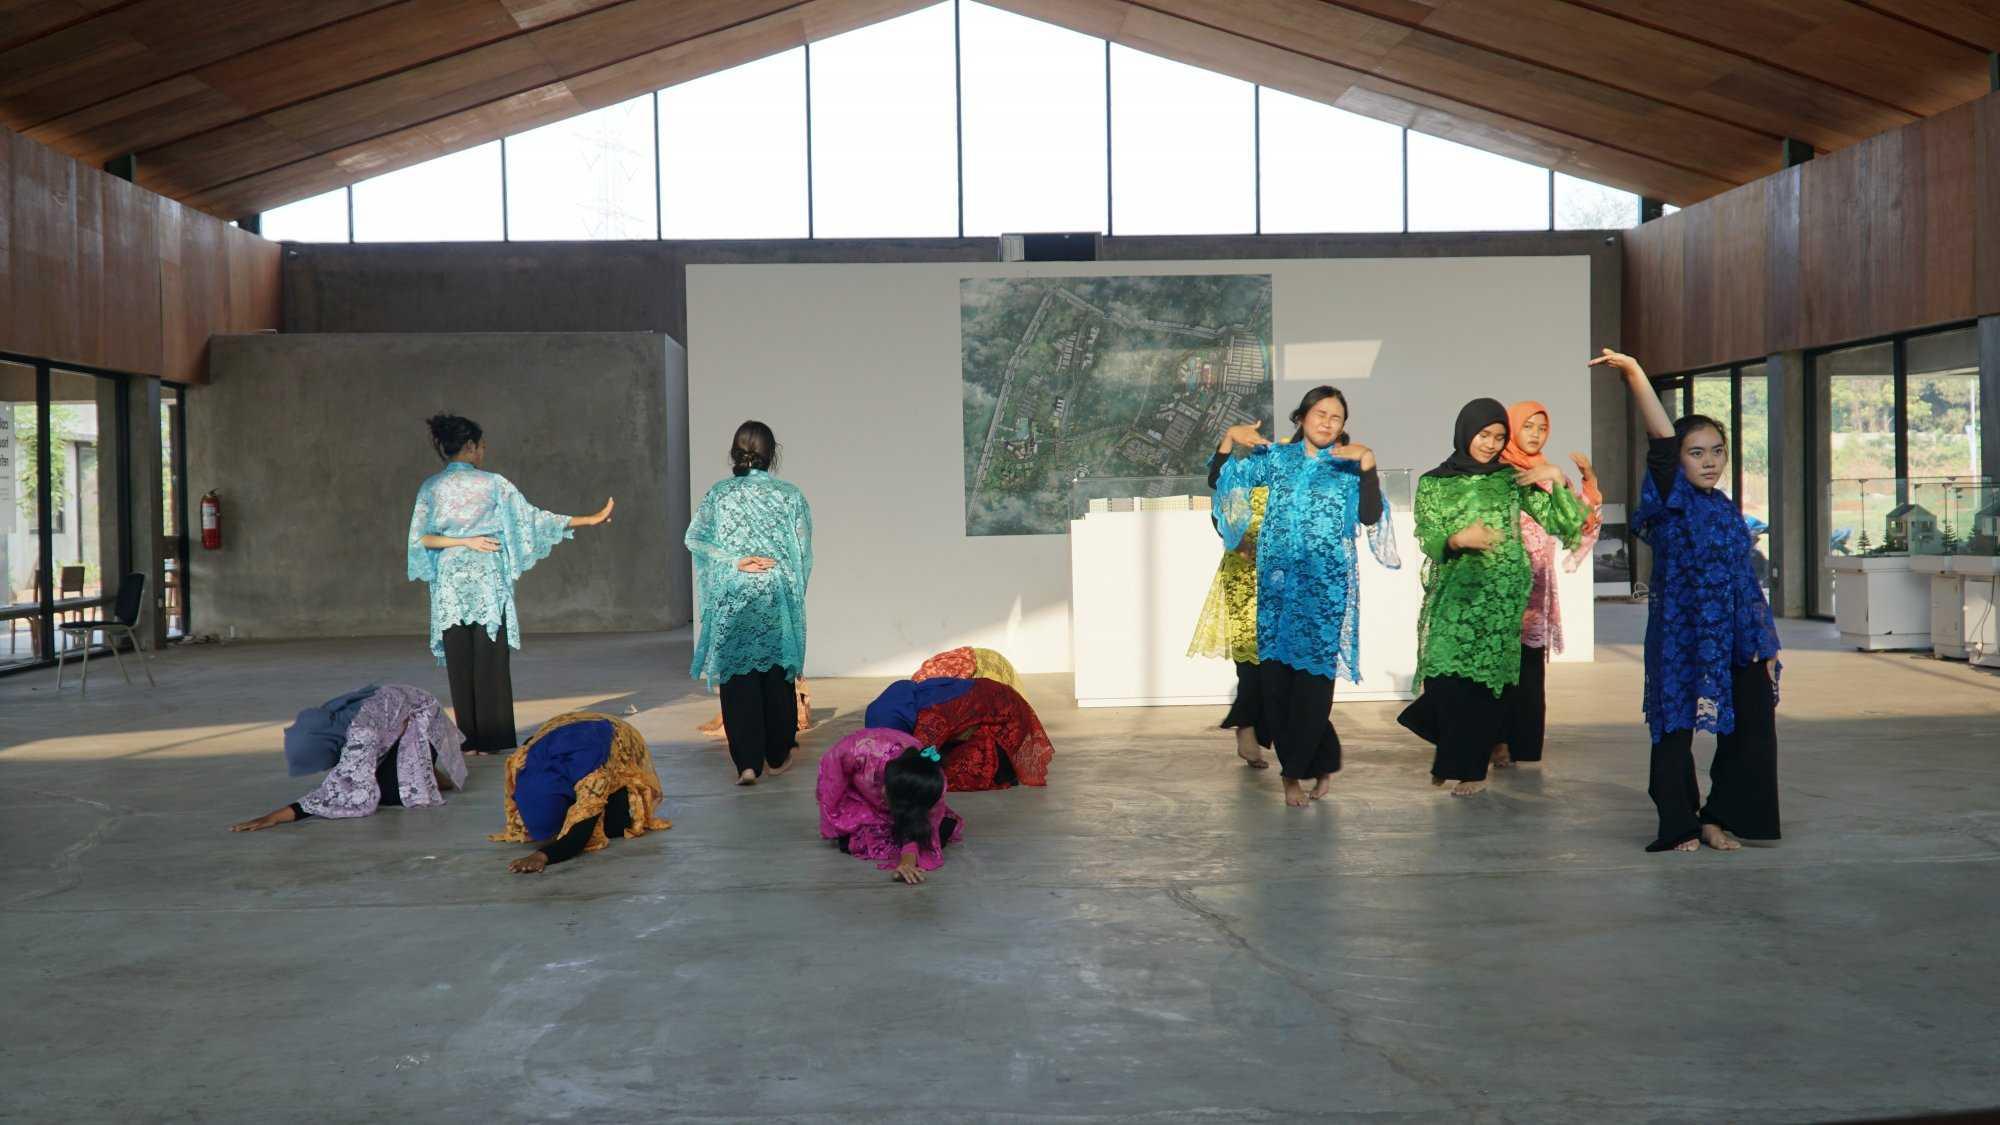 Ganti Konsep Vida Festival Ke 4 Kembali Digelar Di Bantar